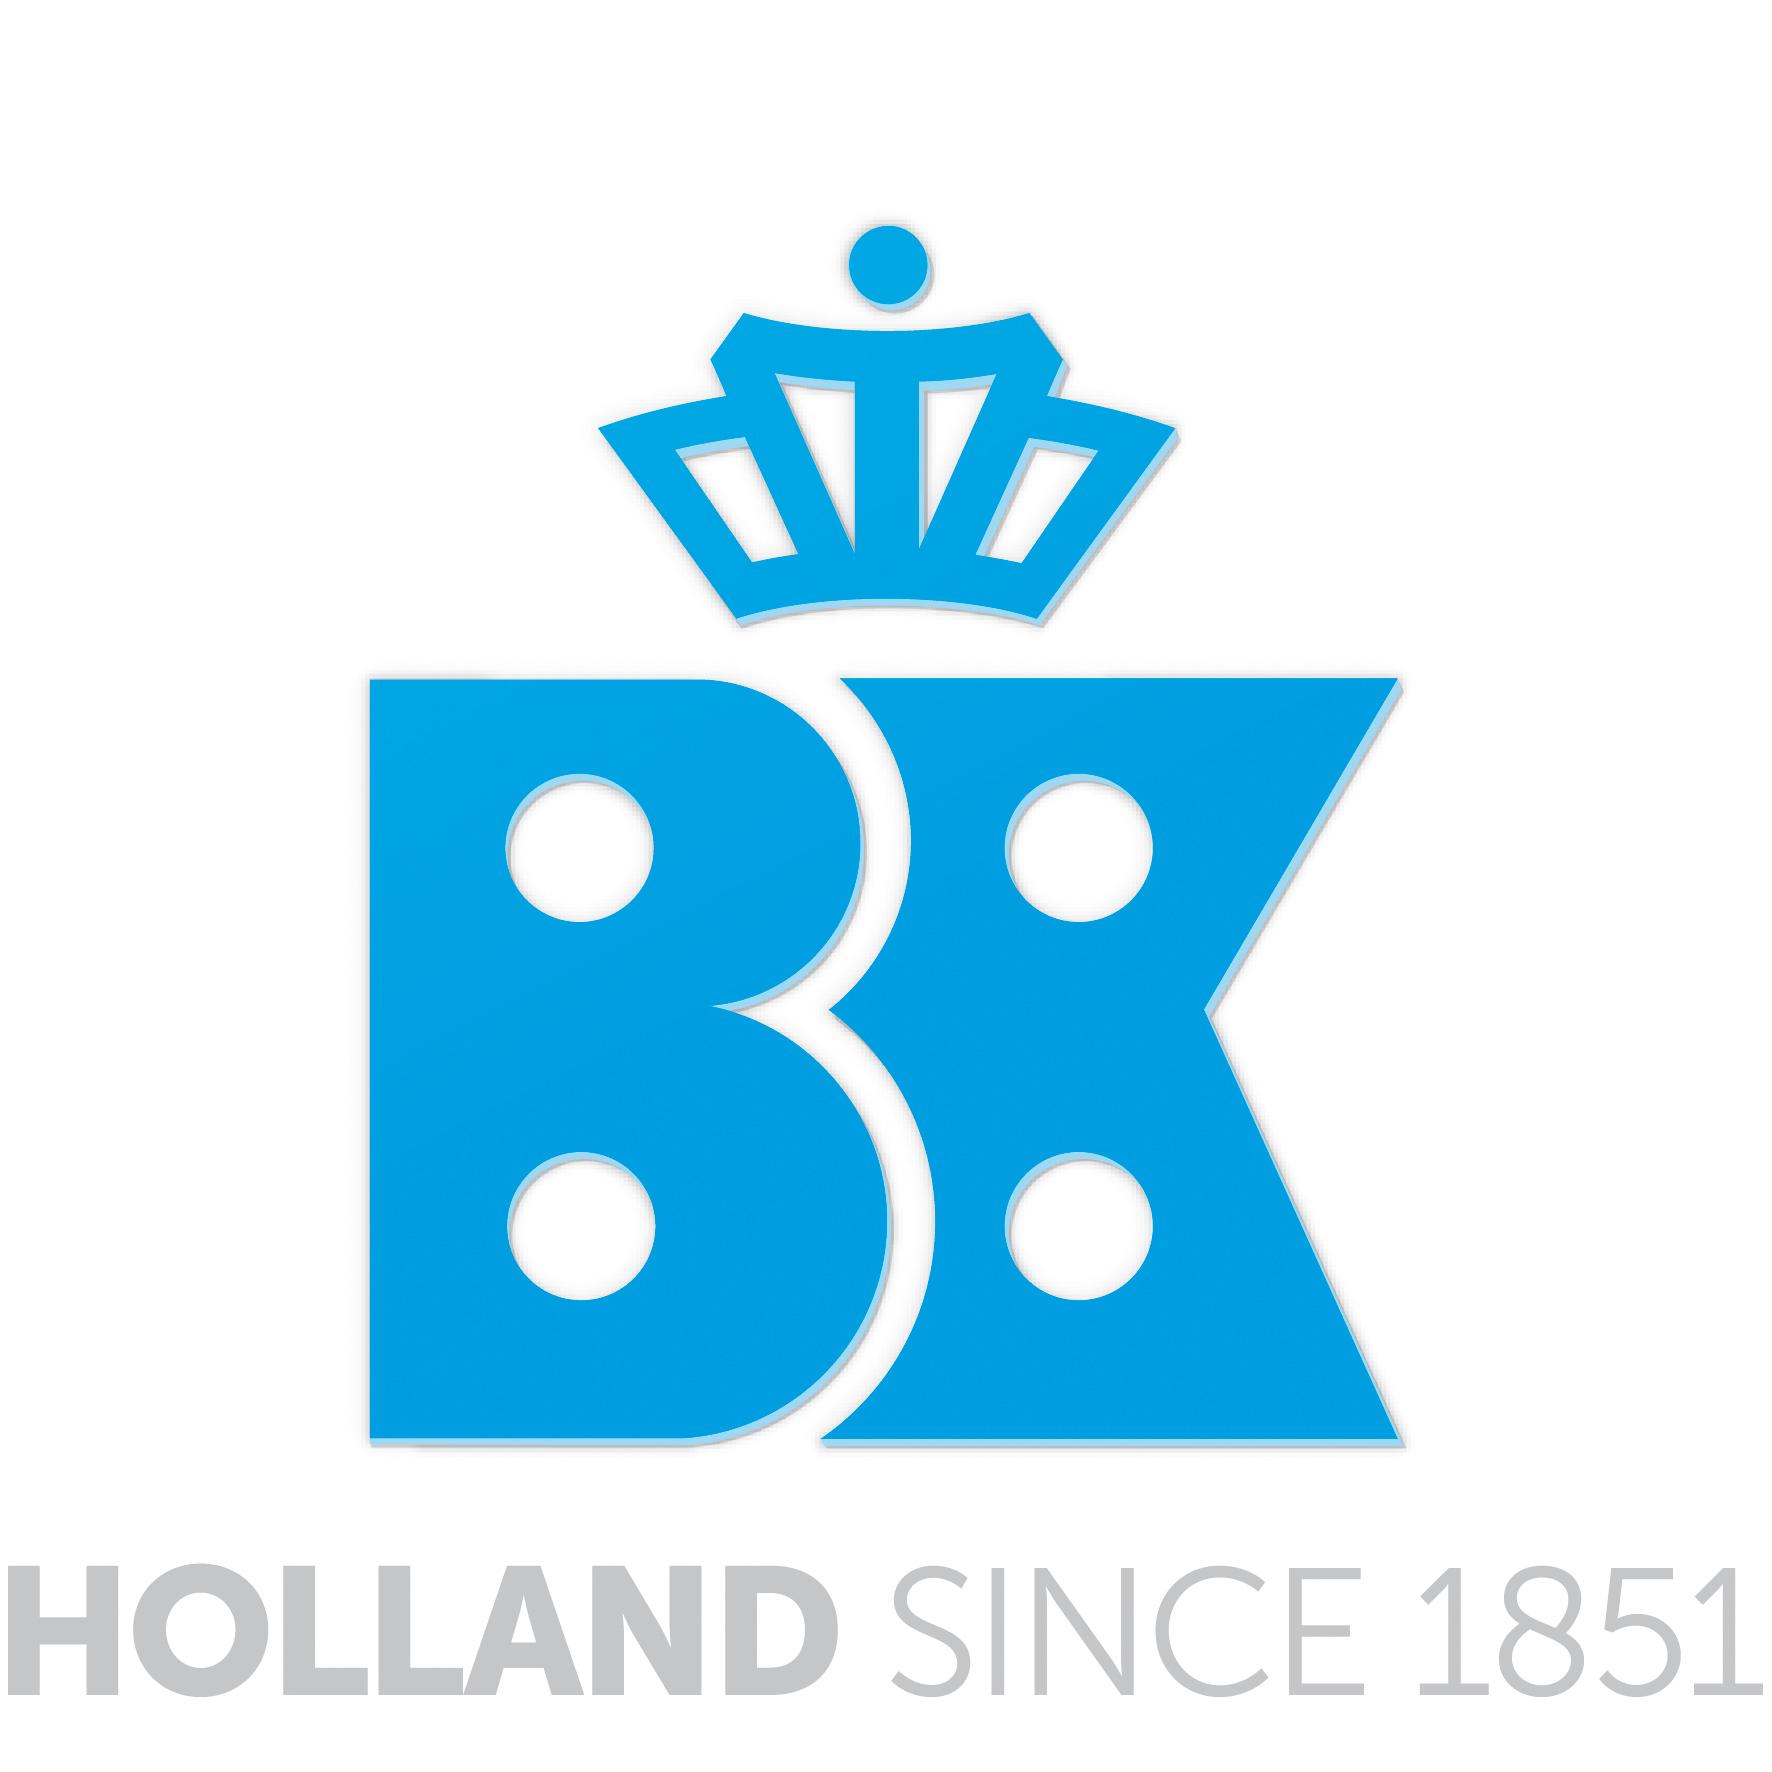 BK_Logo blauw_NL_Payoff_holland_HR.jpg